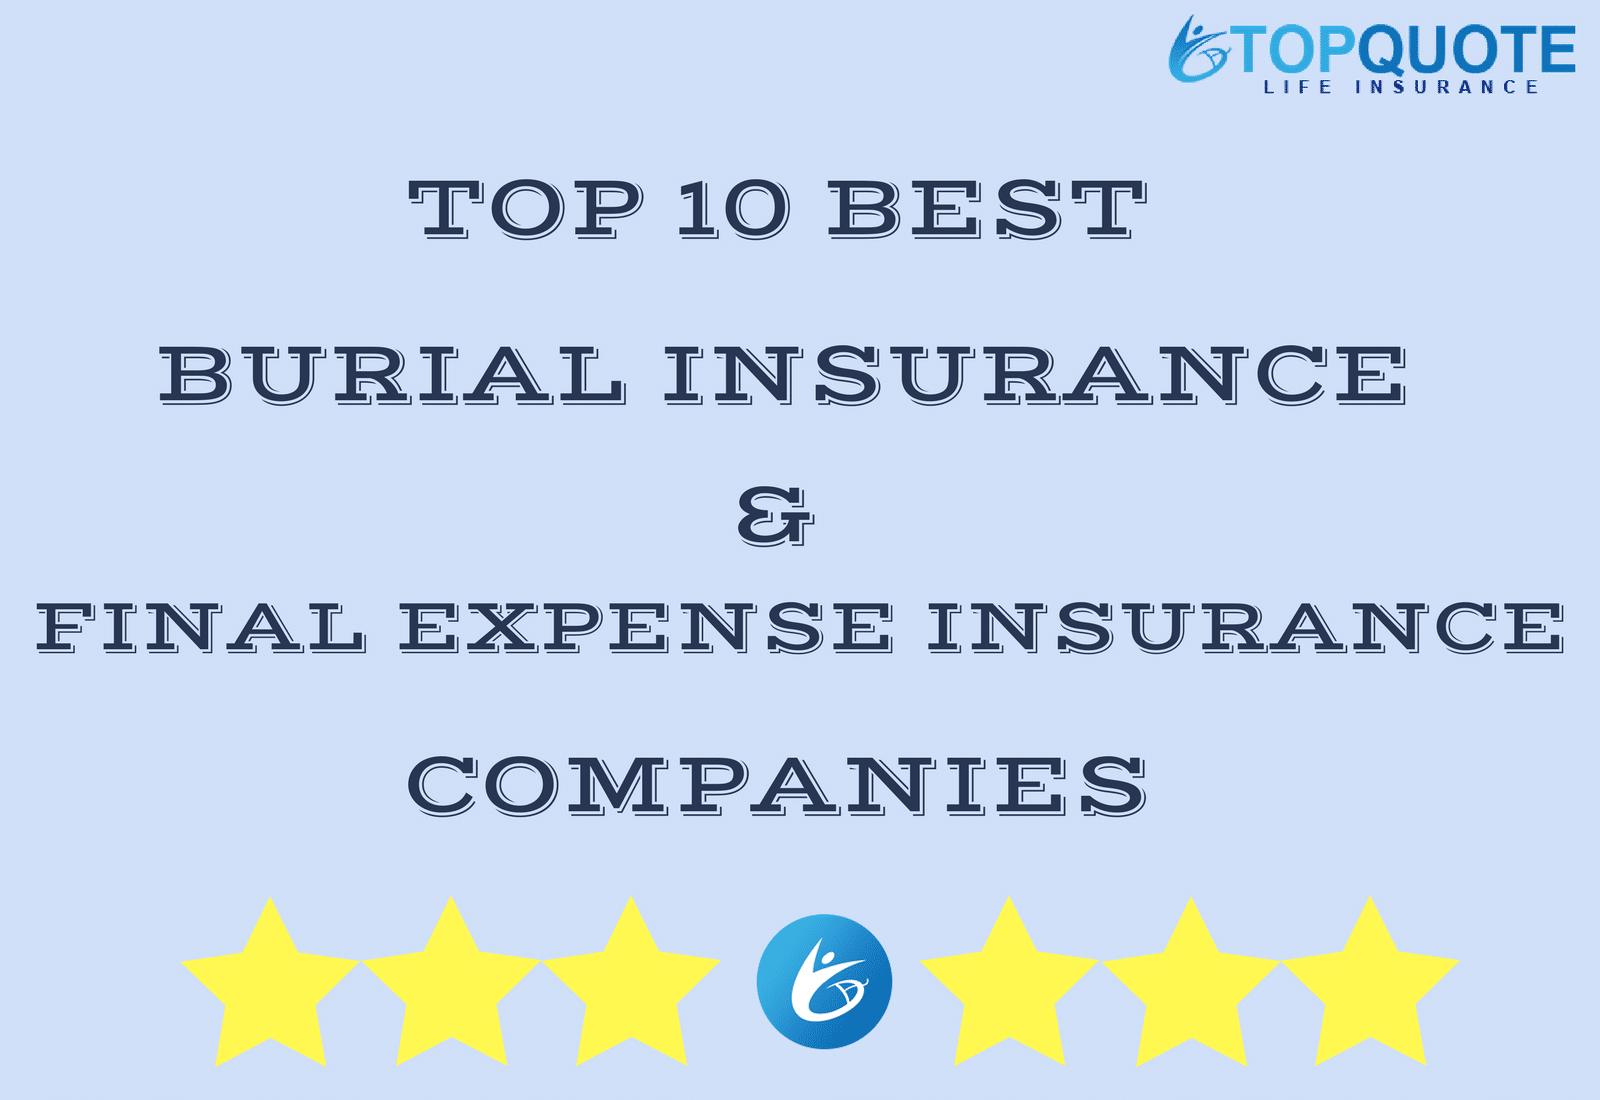 10 Best Burial Insurance Final Expense Insurance Companies